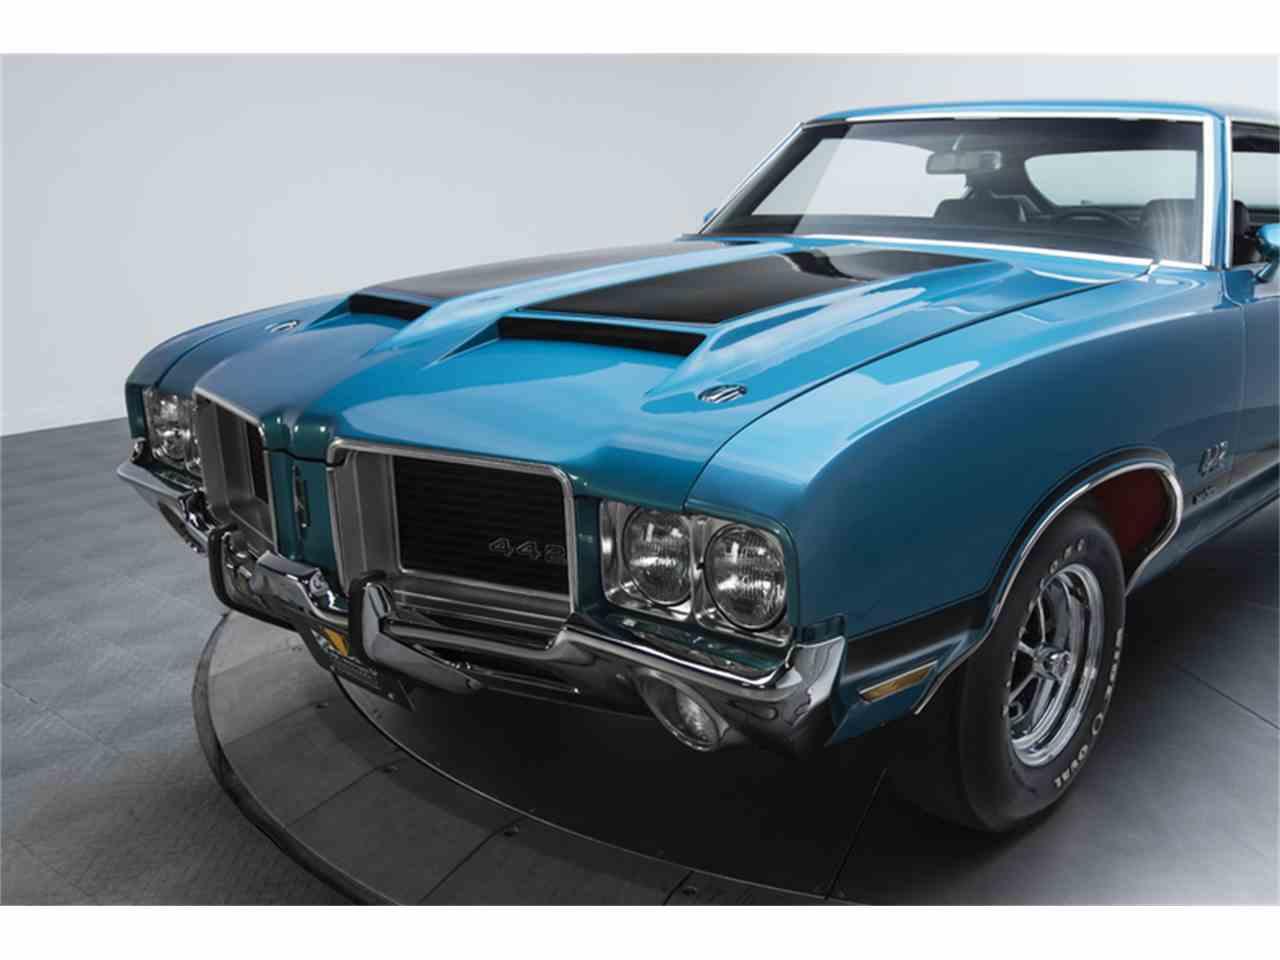 Large Picture of Classic '71 442 located in Charlotte North Carolina - $104,900.00 - IKOQ